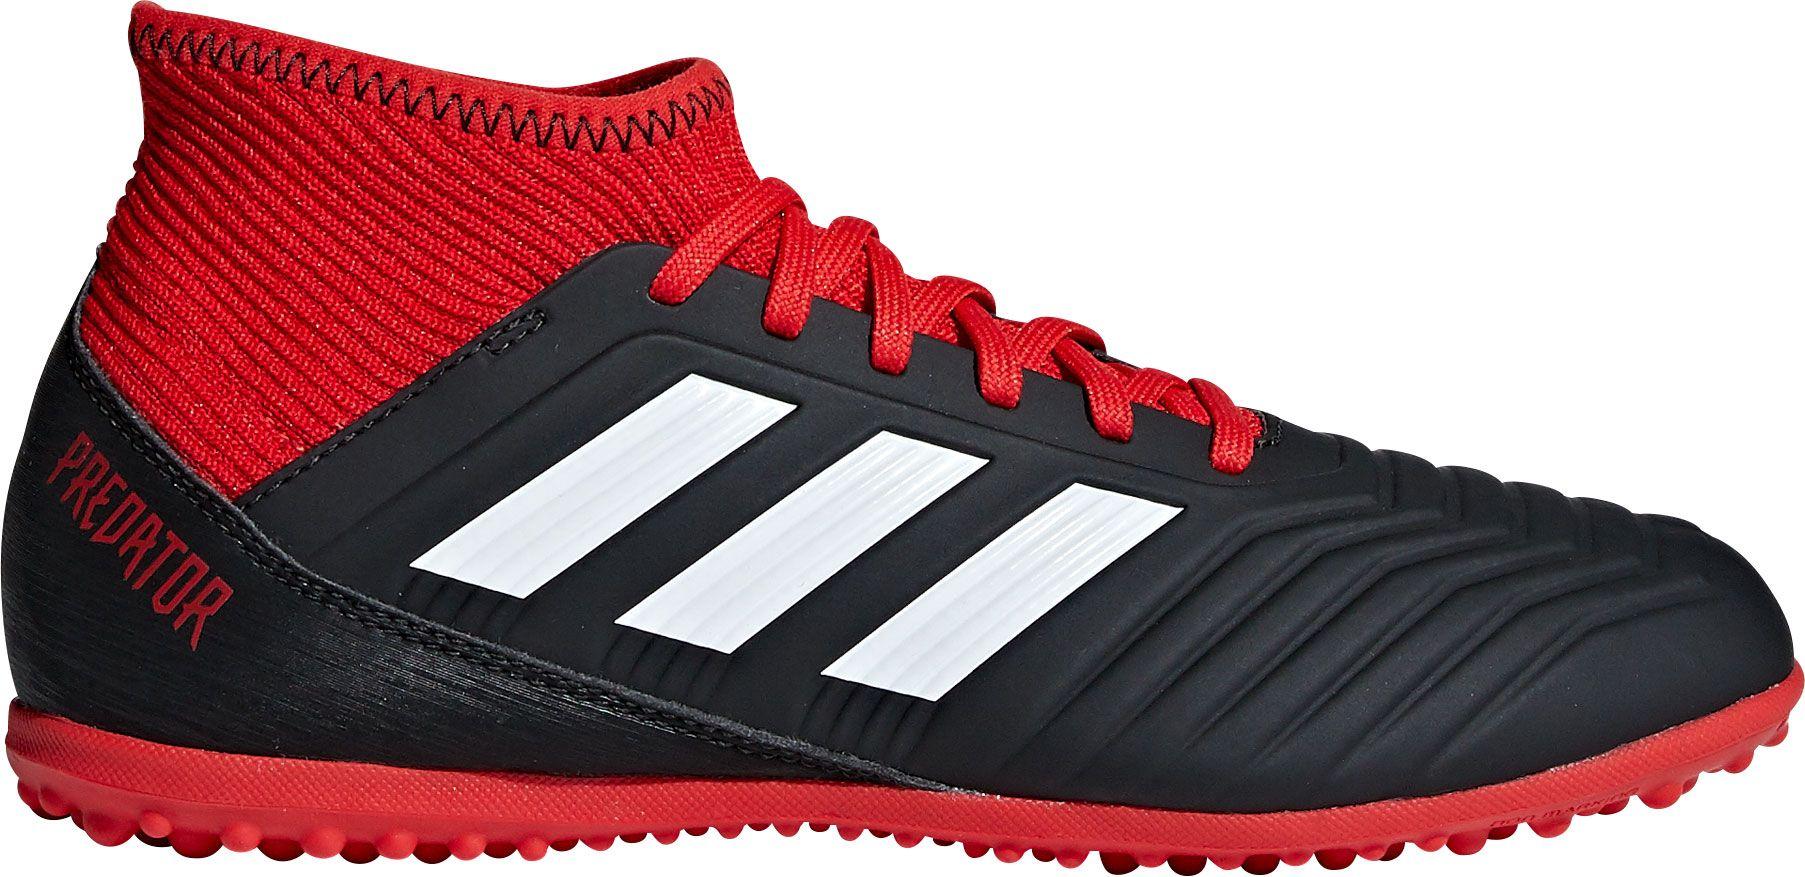 adidas Kids' Predator Tango 18.3 Turf Soccer Cleats, Kids Unisex, Size: 1.5, Black